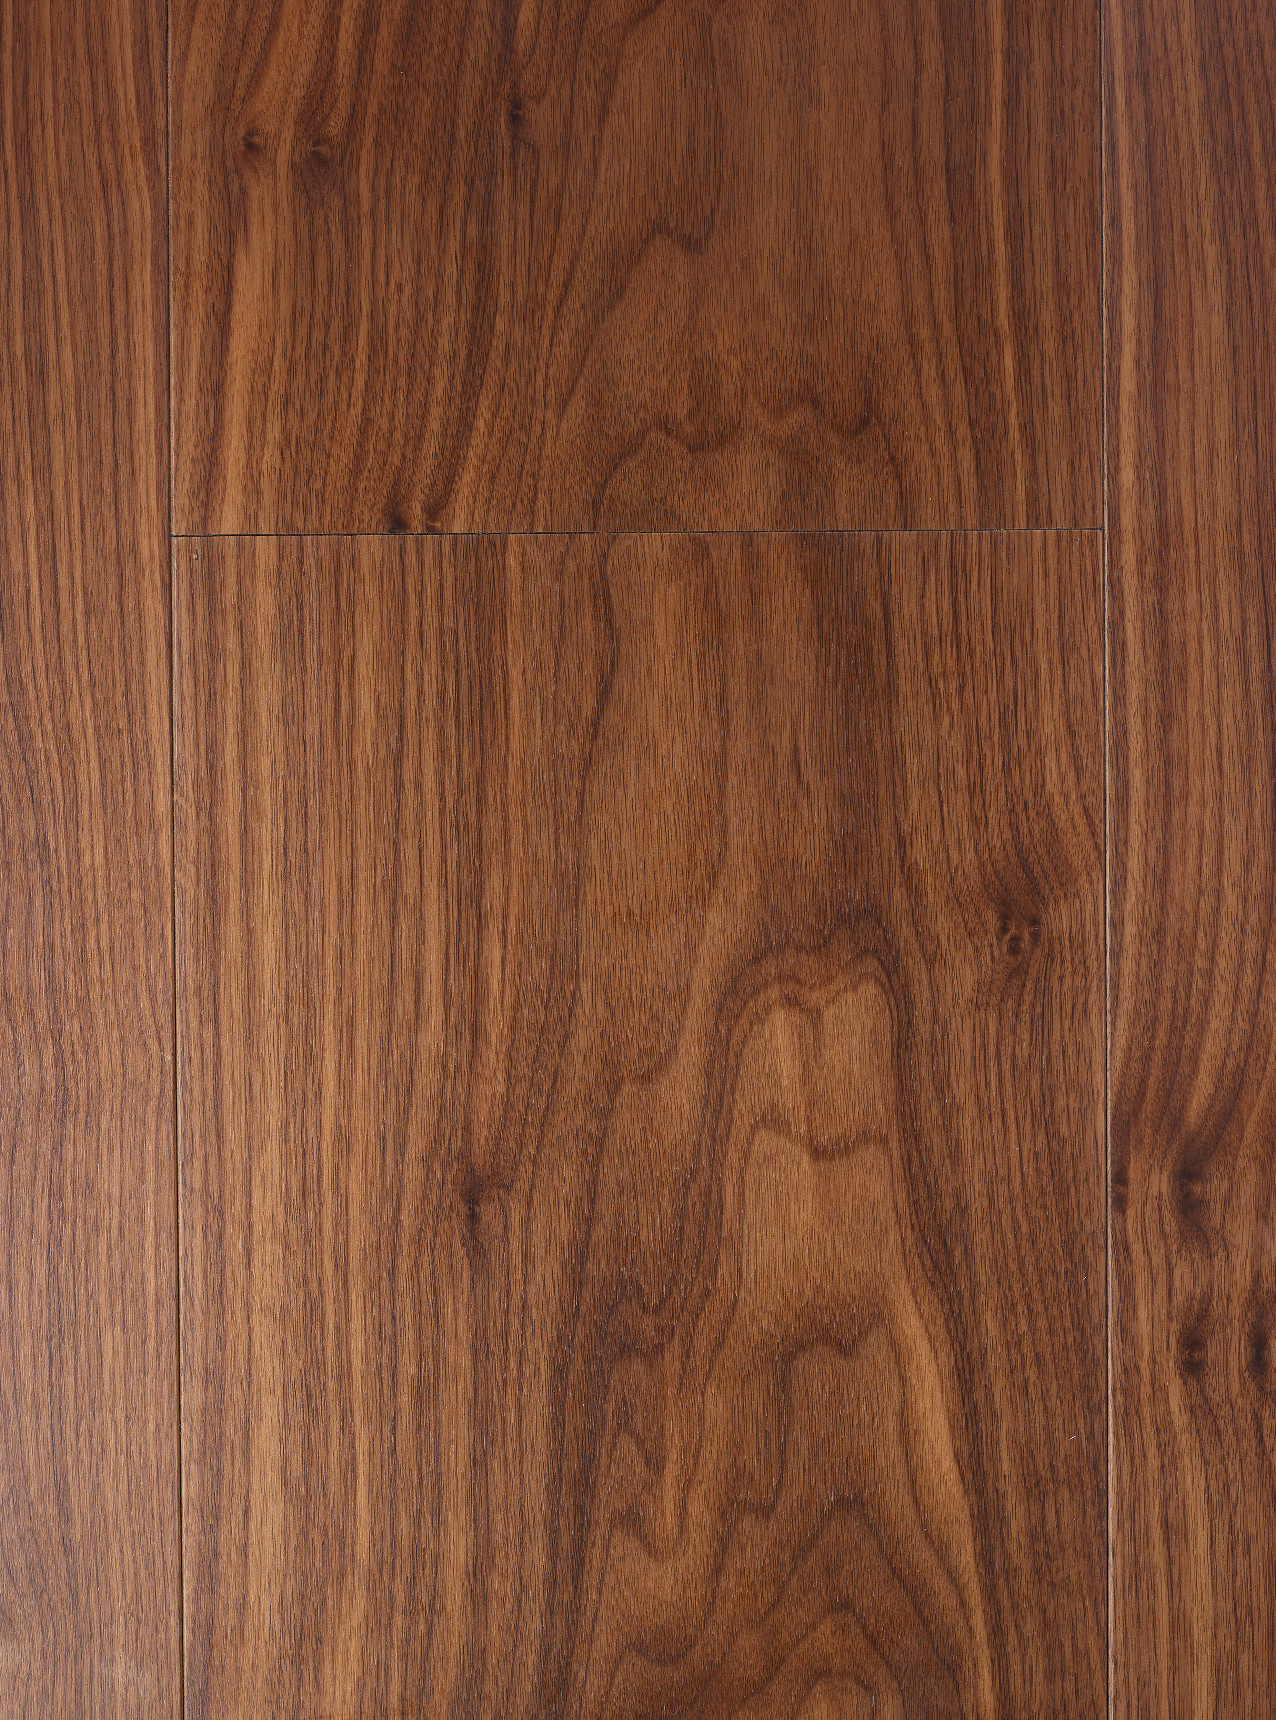 American Black Walnut plank